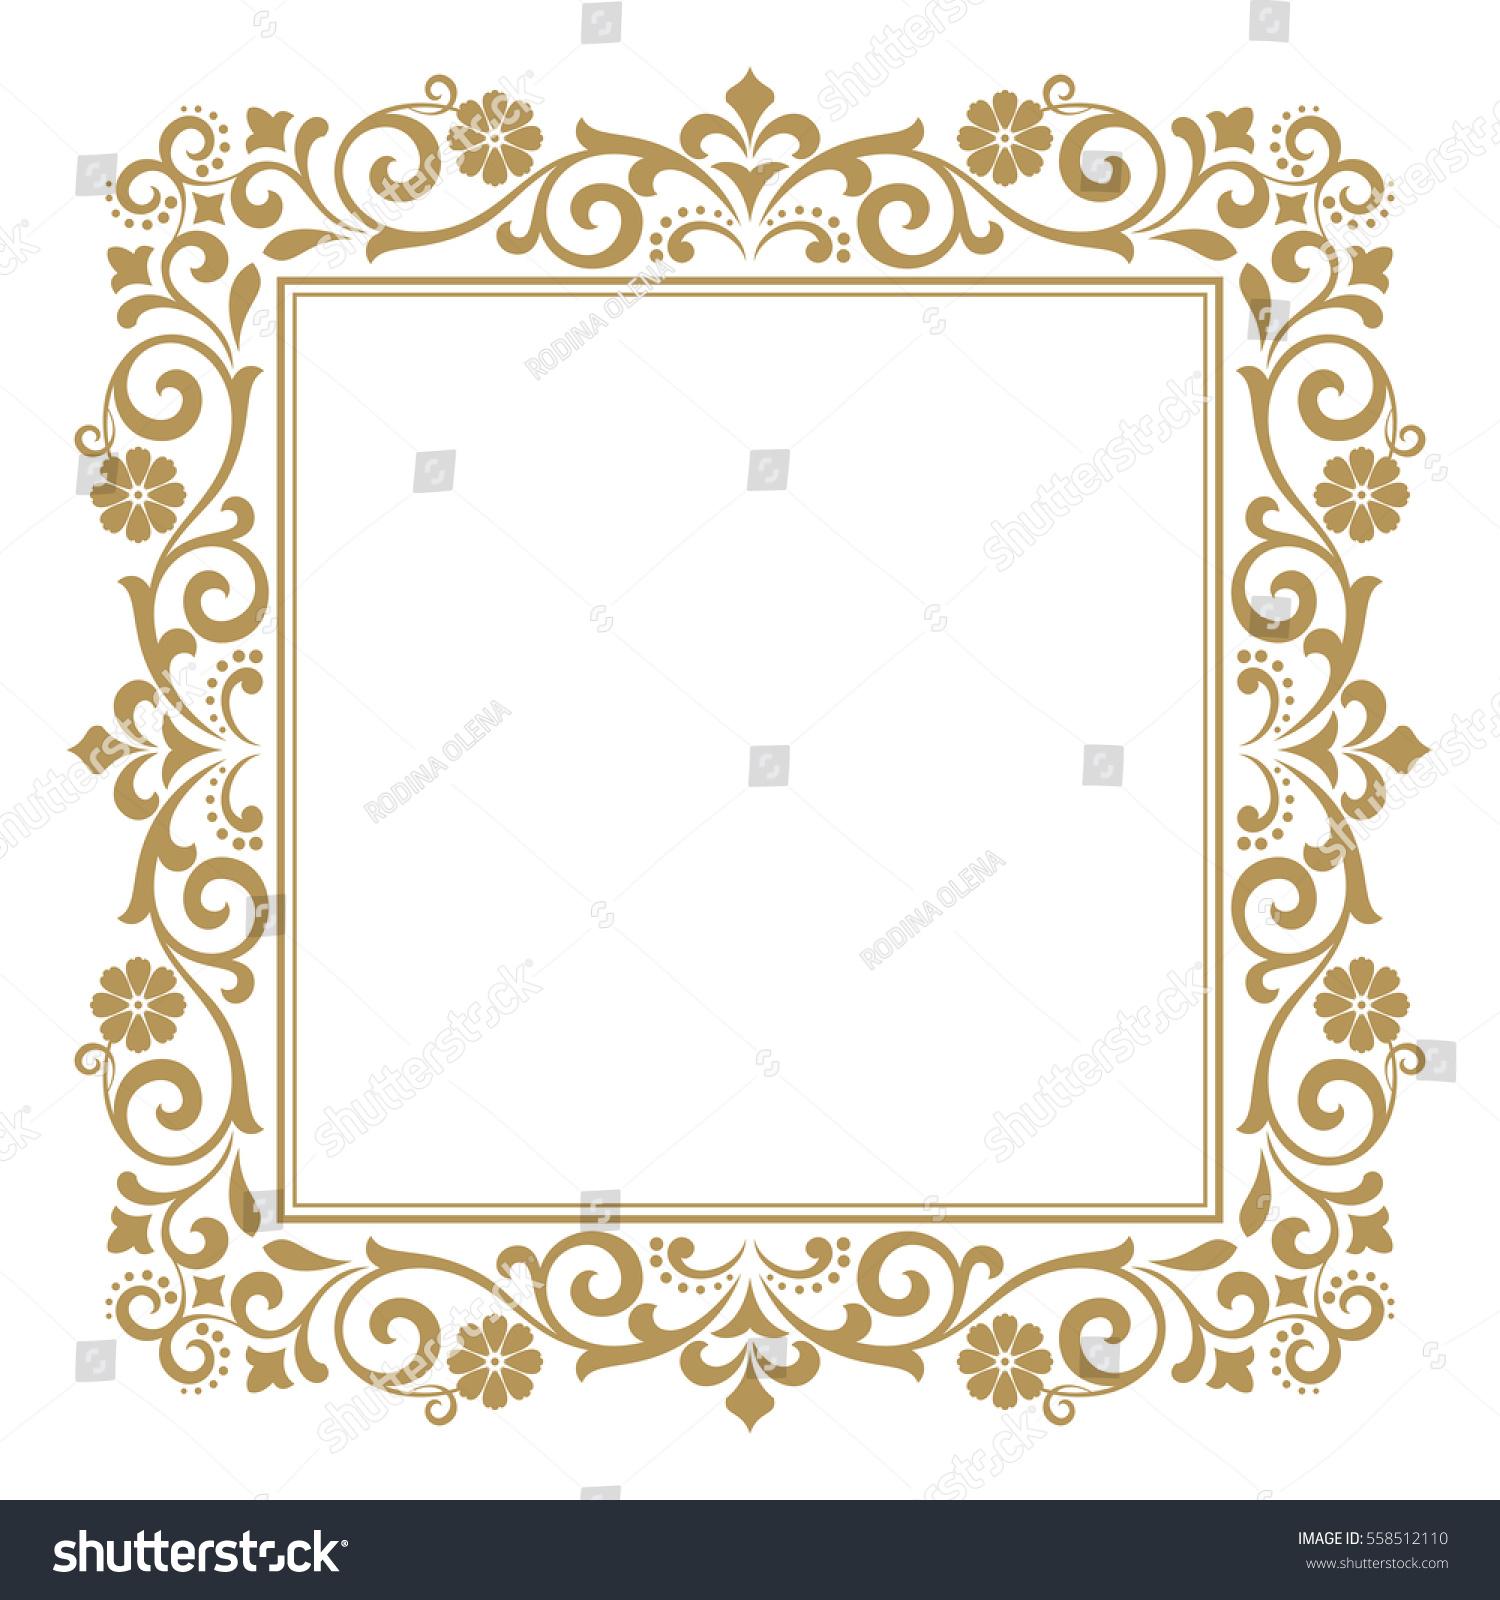 Line Art Frames : Decorative line art frames design template stock vector